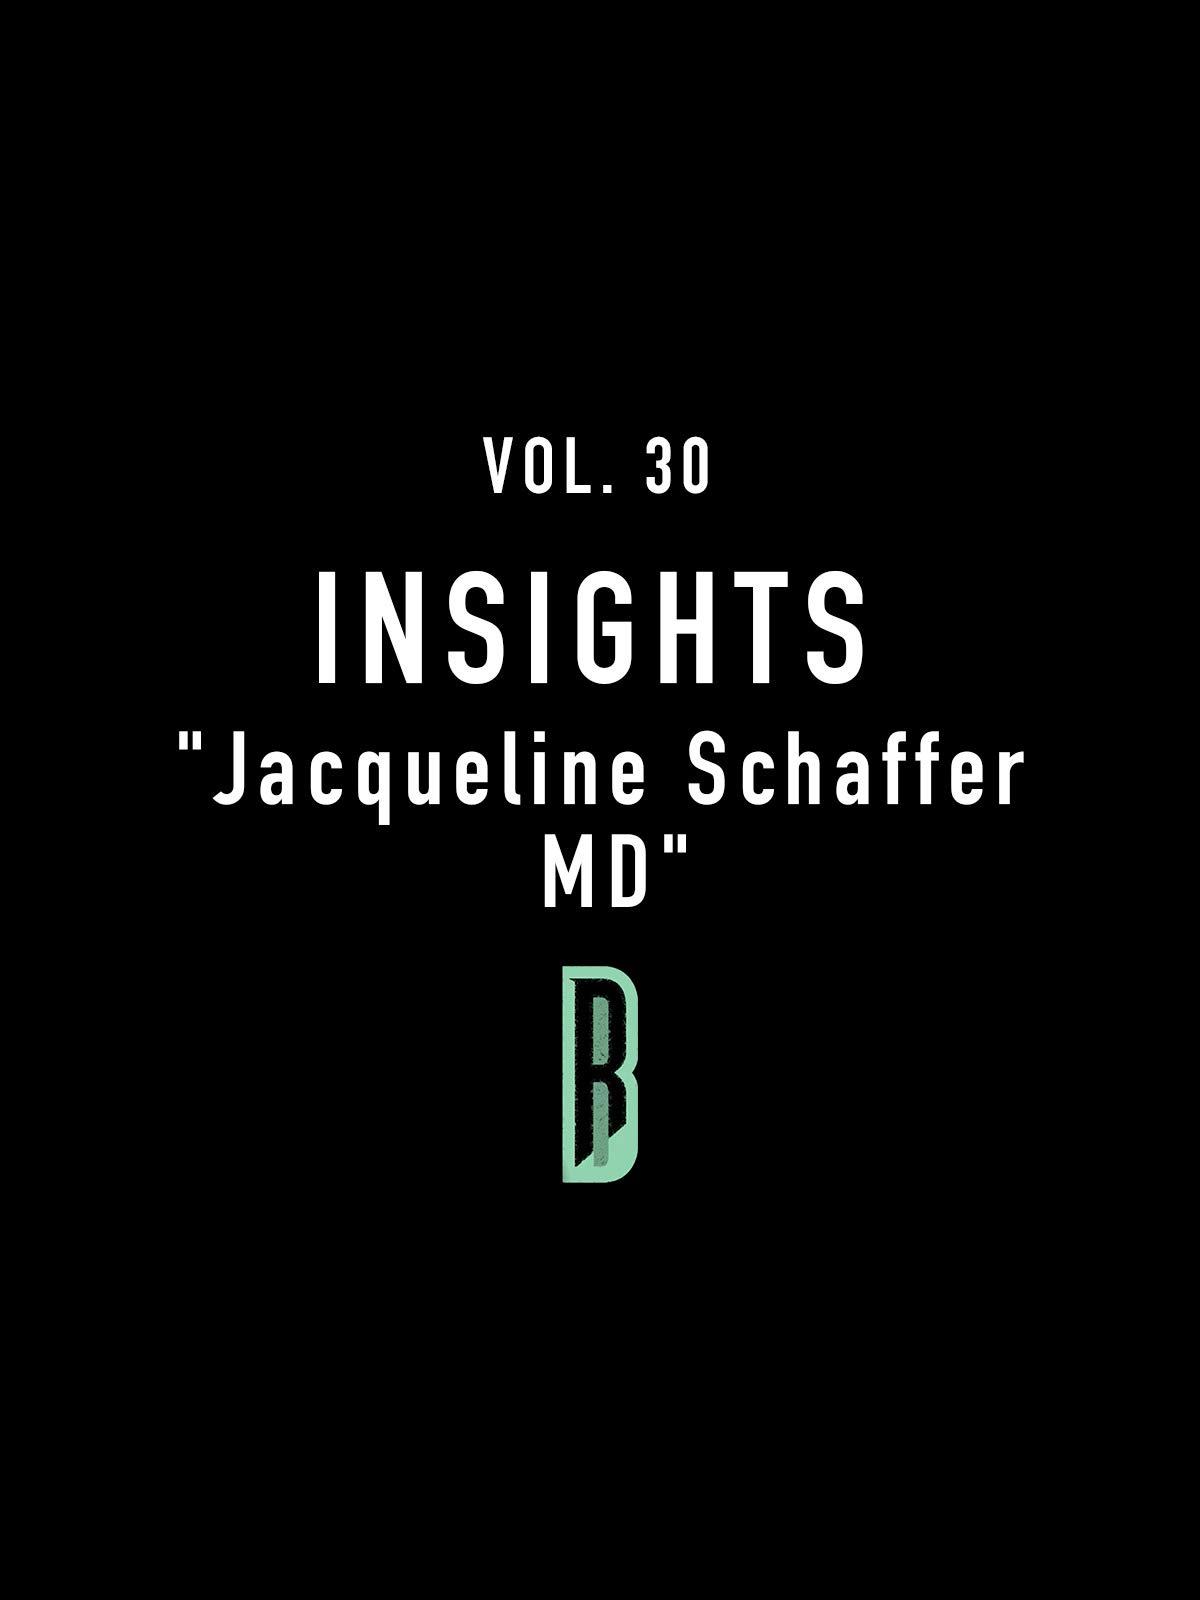 Insights Vol. 30